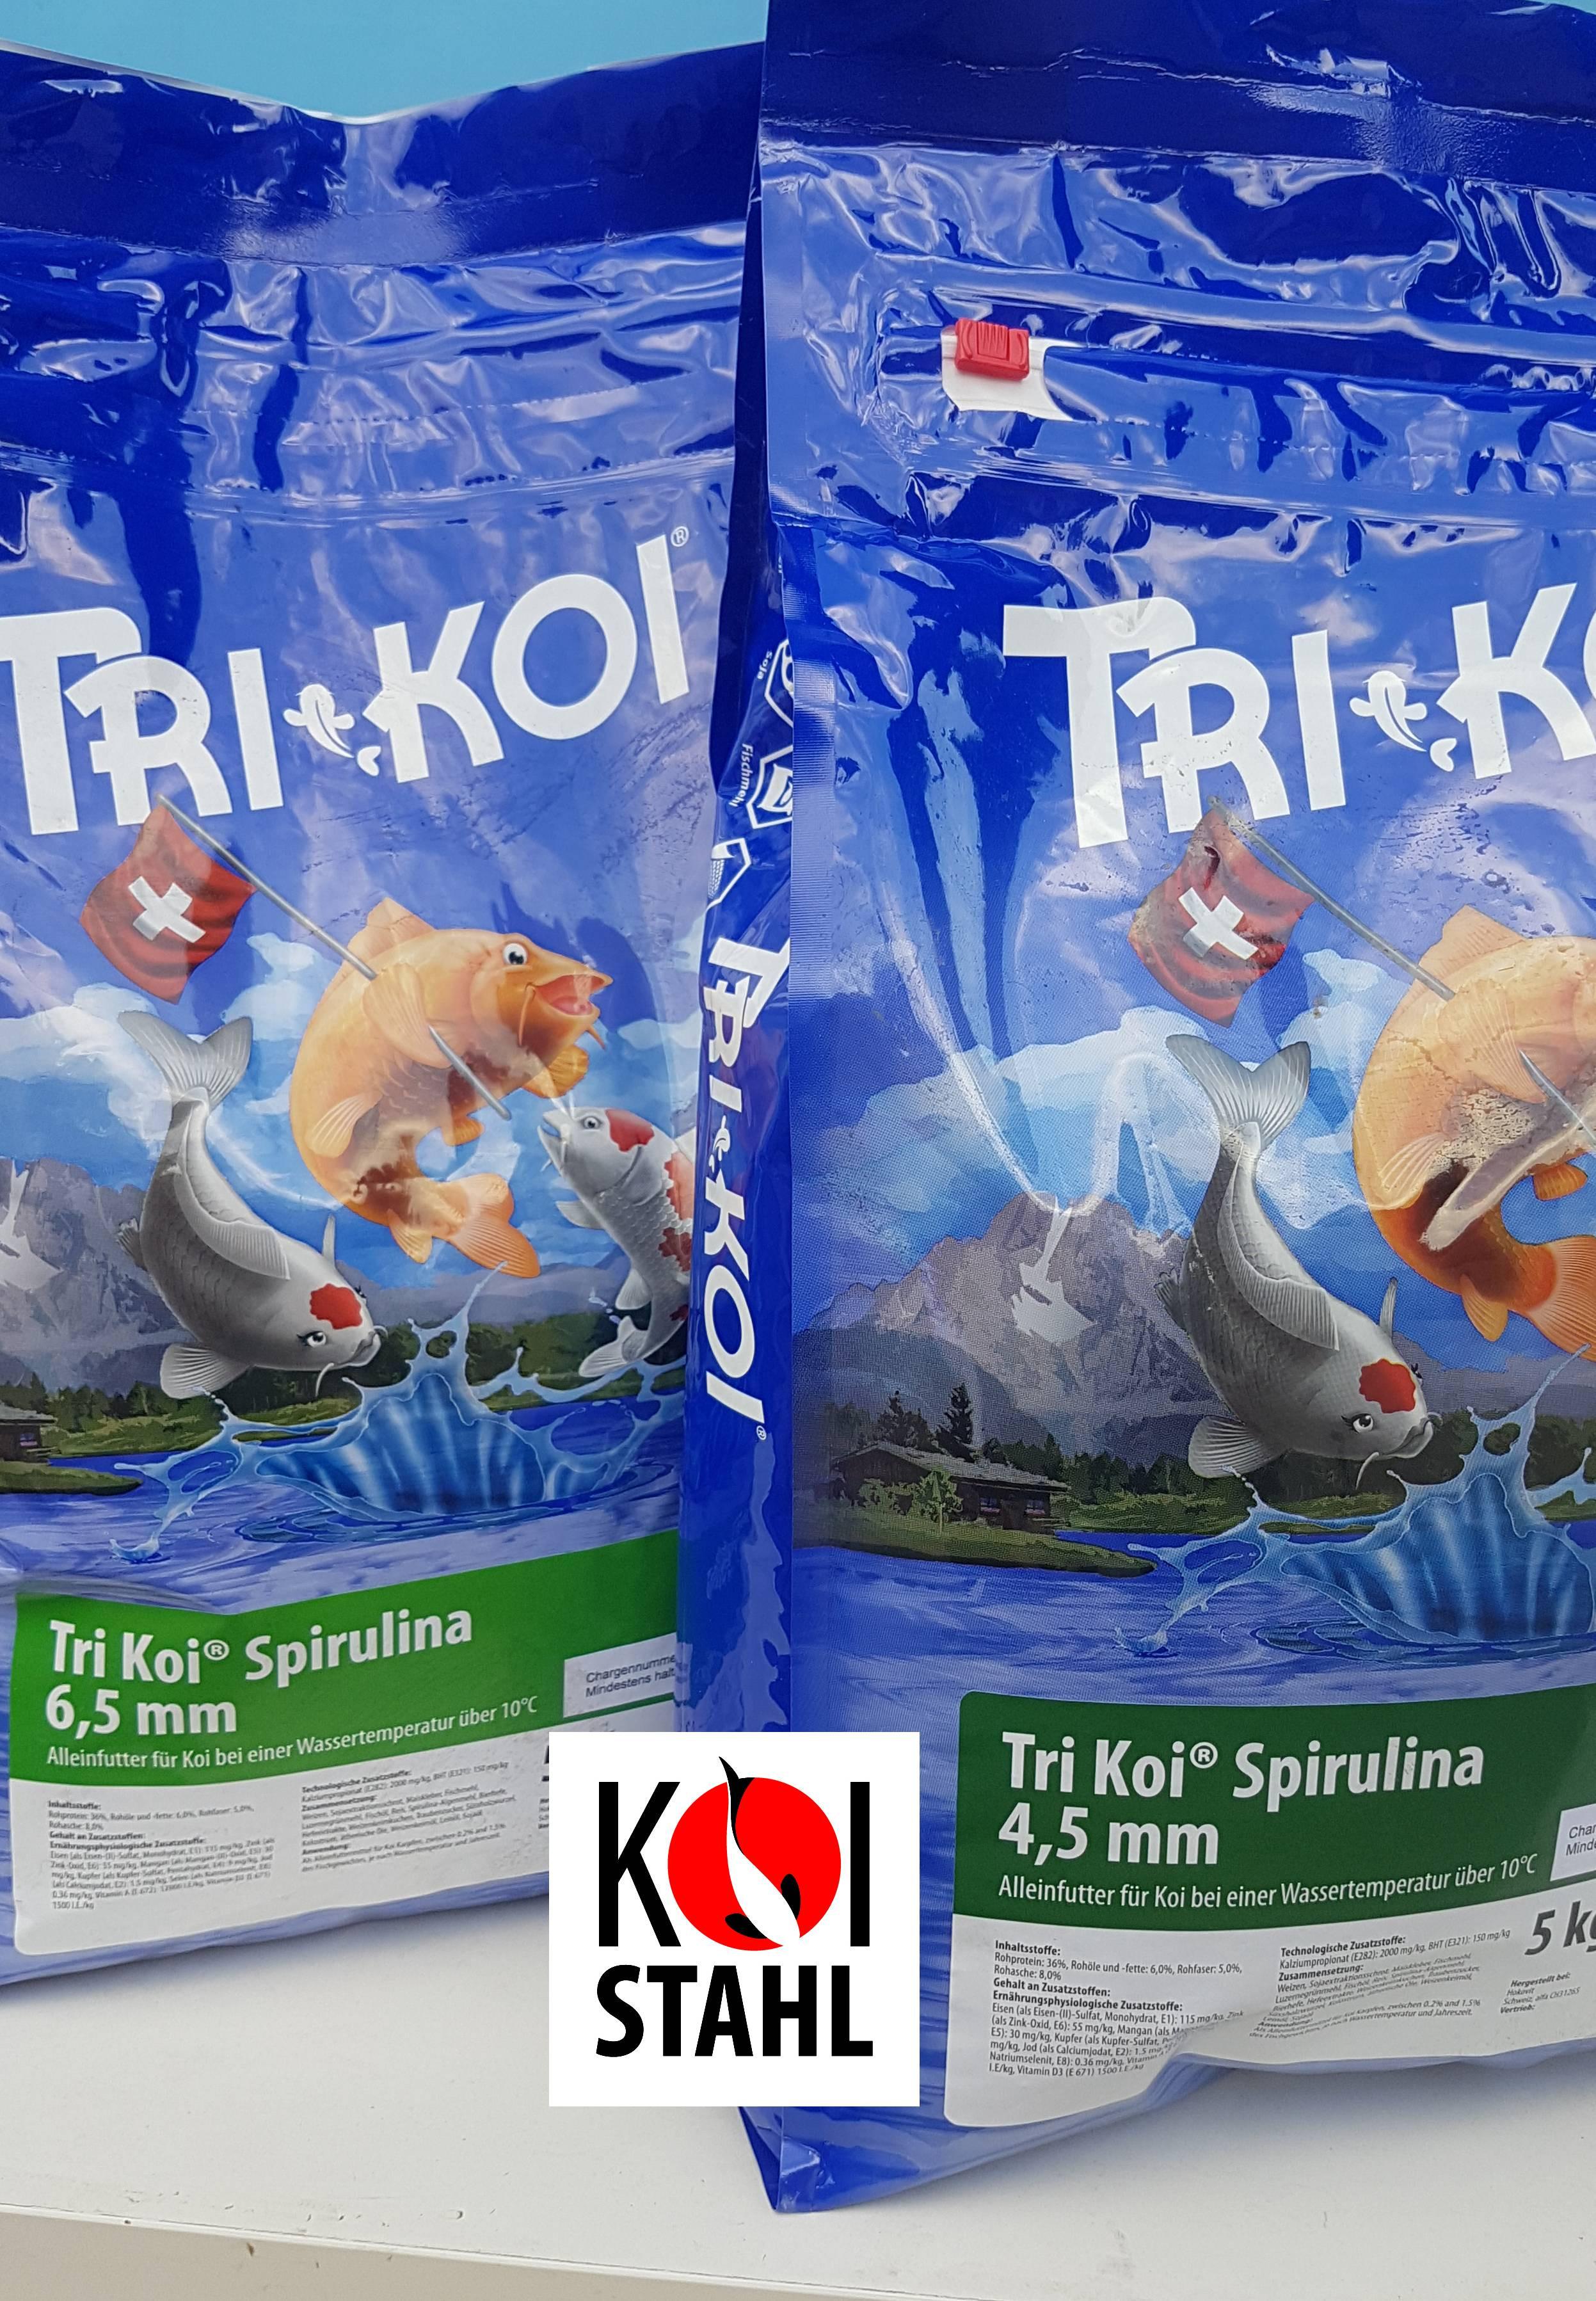 TriKoi  spirulina 4,5mm/5kg